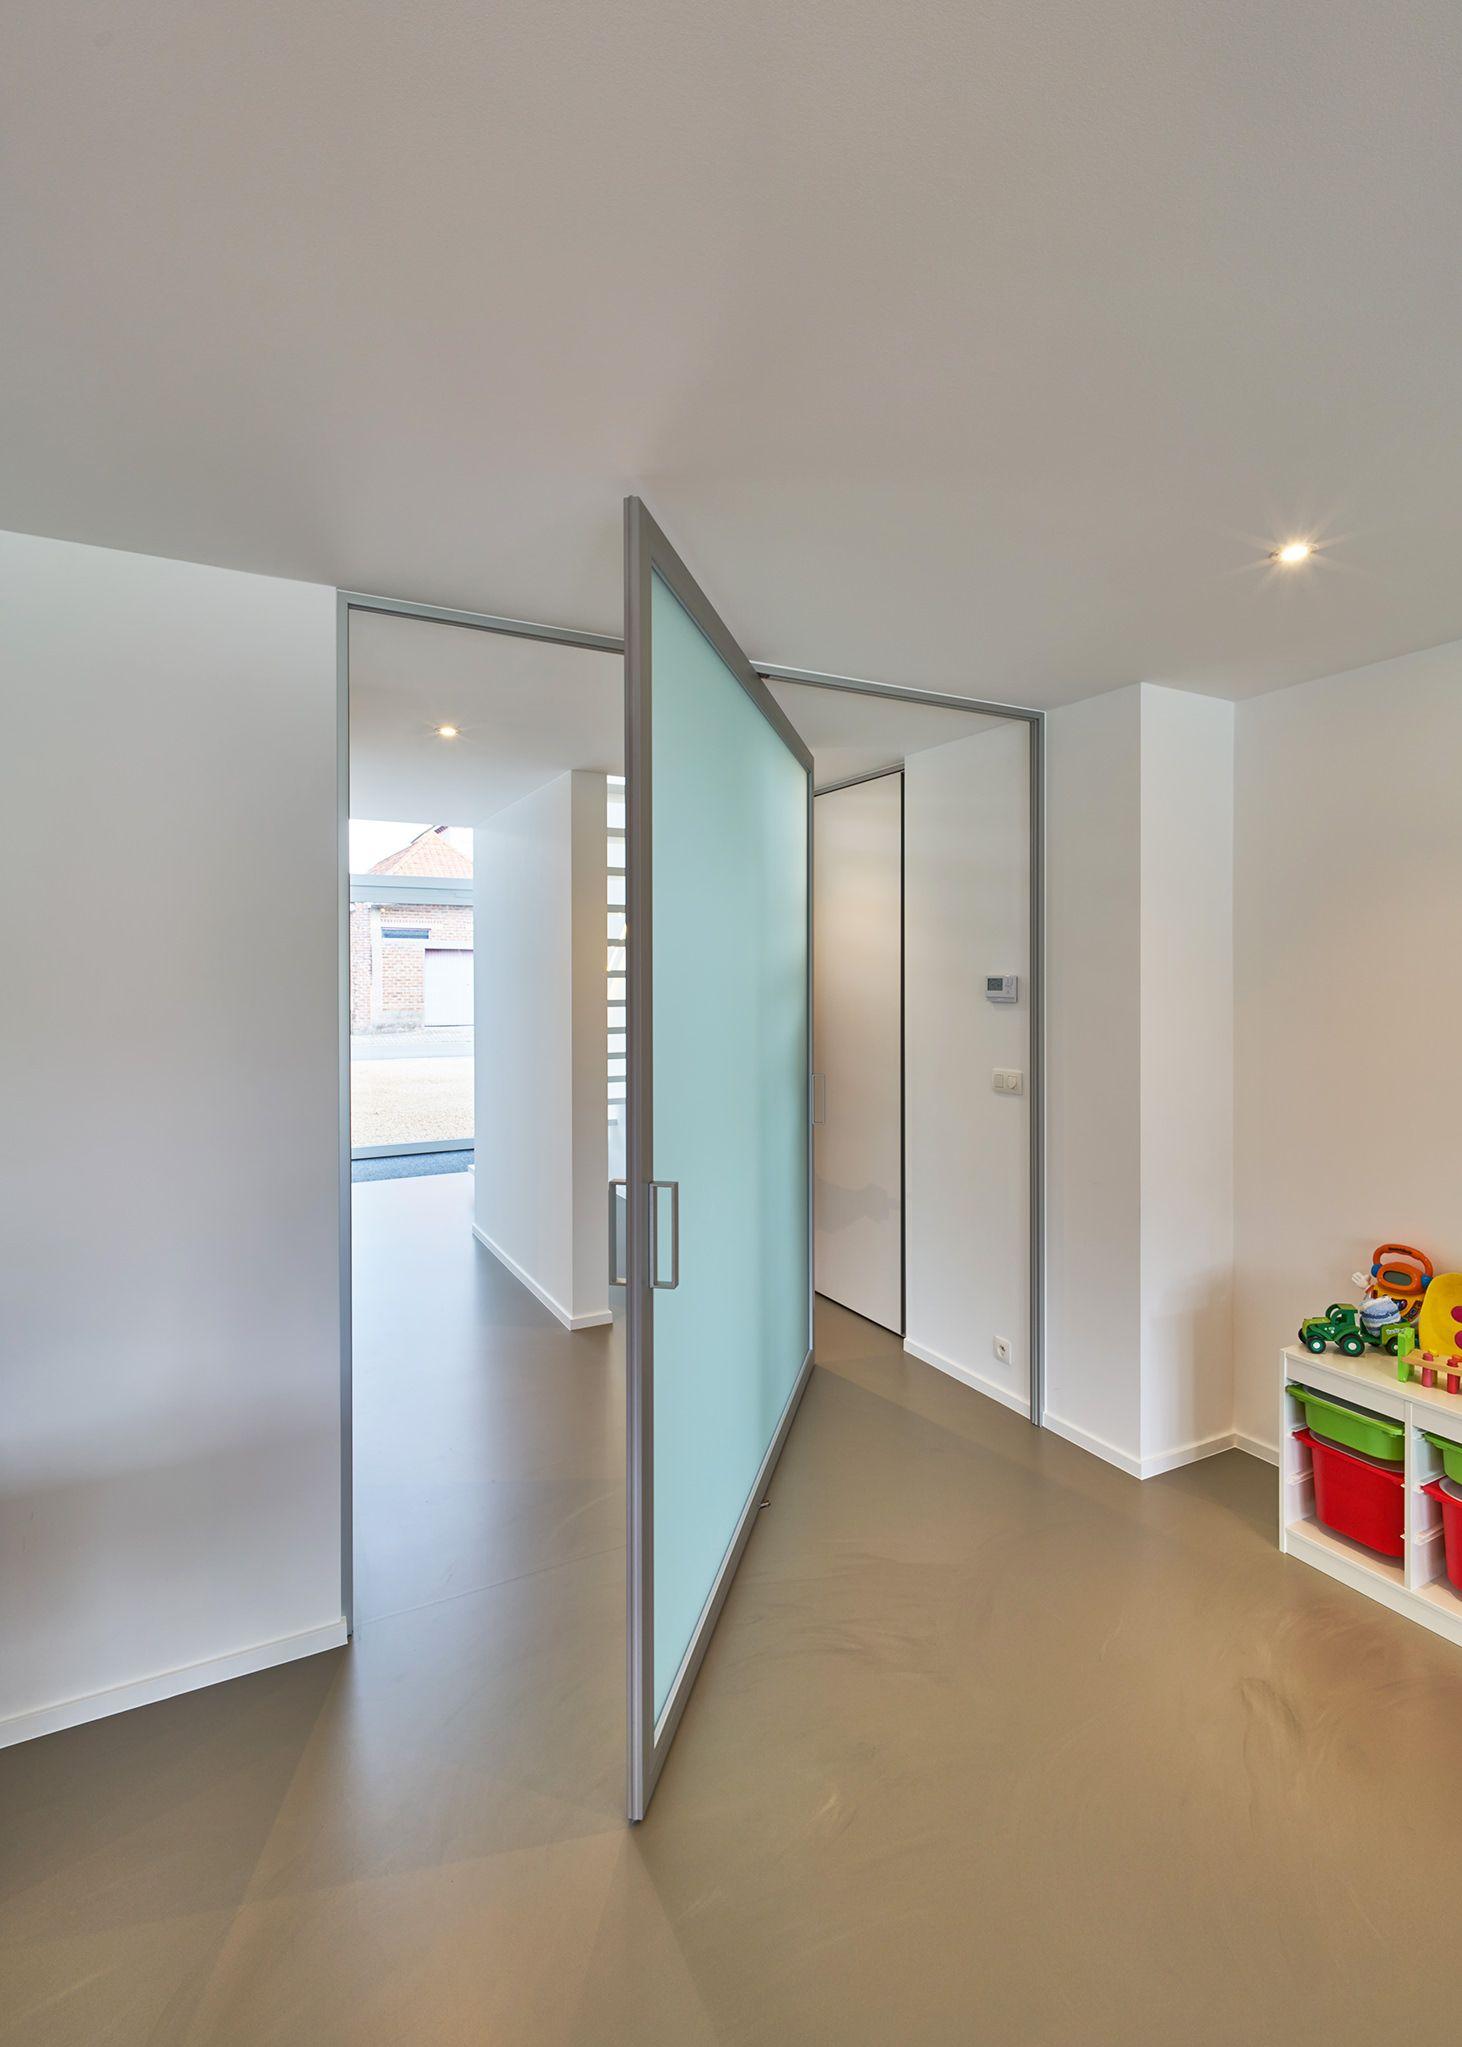 pivot hinge closet door. matte glass pivot door with central axis pivoting hinge. hinge closet